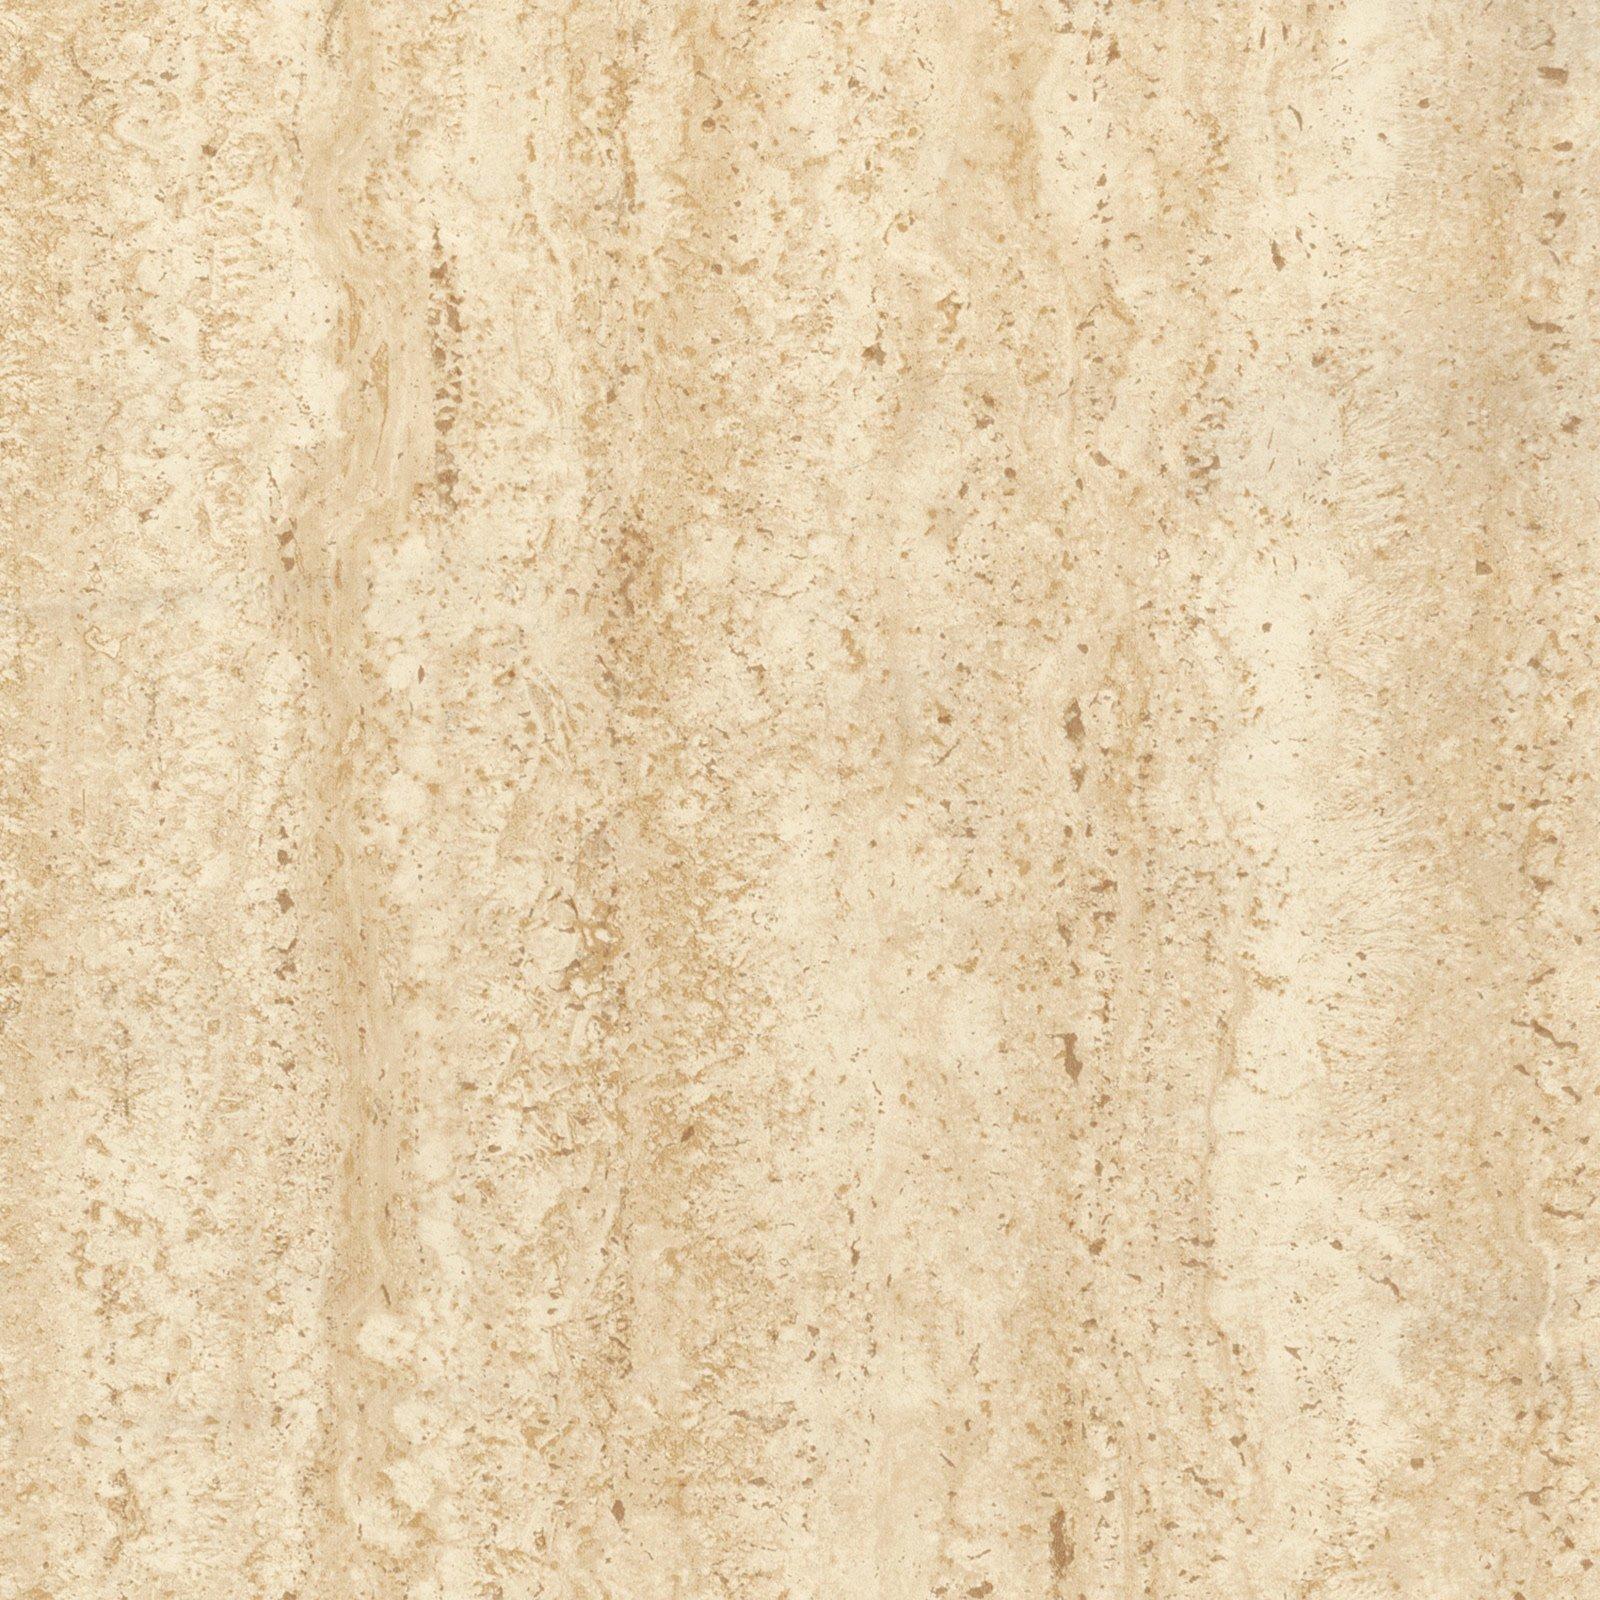 d-c fix Klebefolie FONTANA - beige - Marmor - 45x200 cm